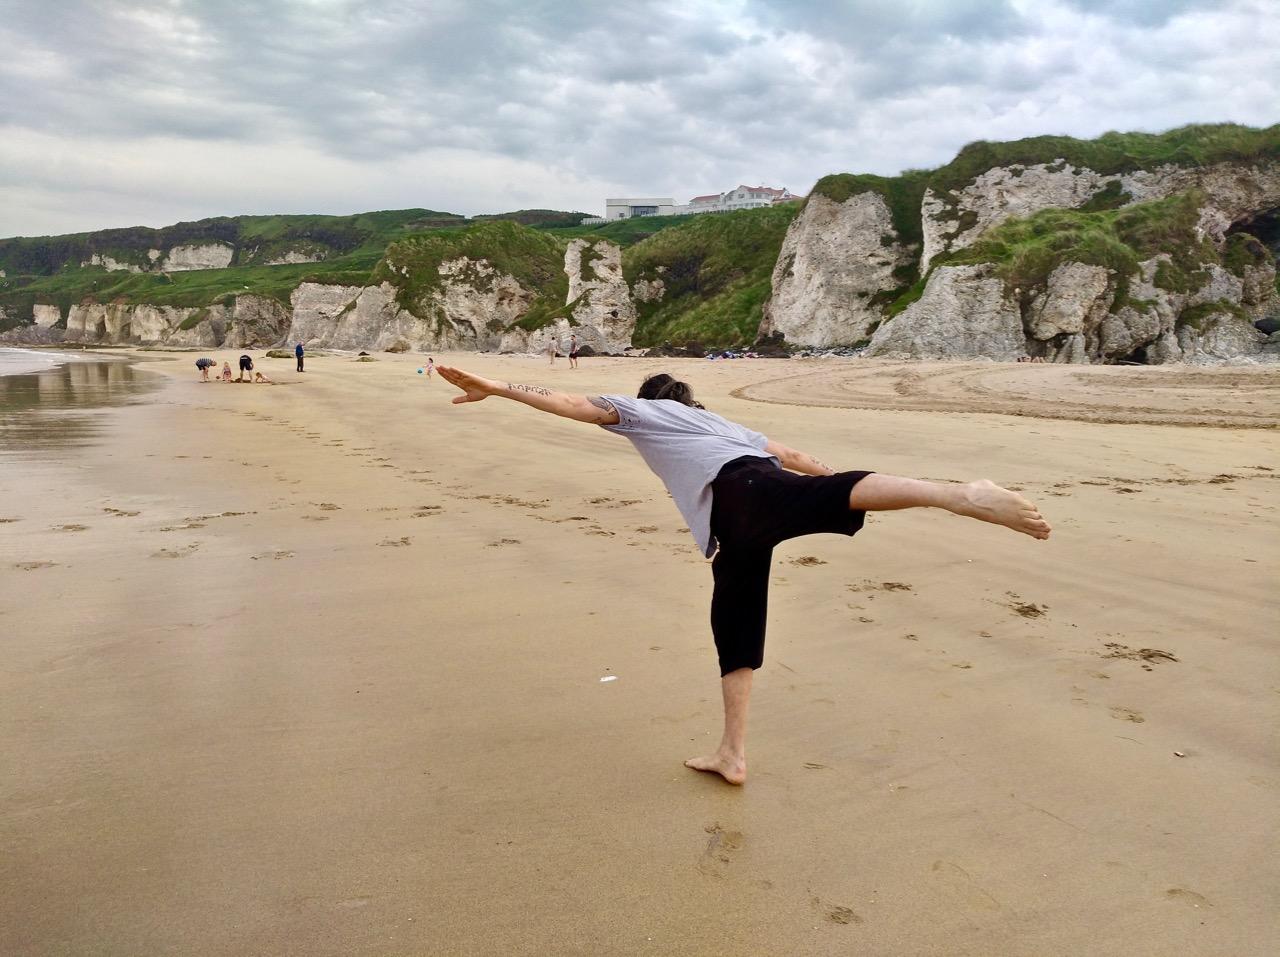 day trip to the beach from Belfast : Whiterocks beach in Portrush (17)